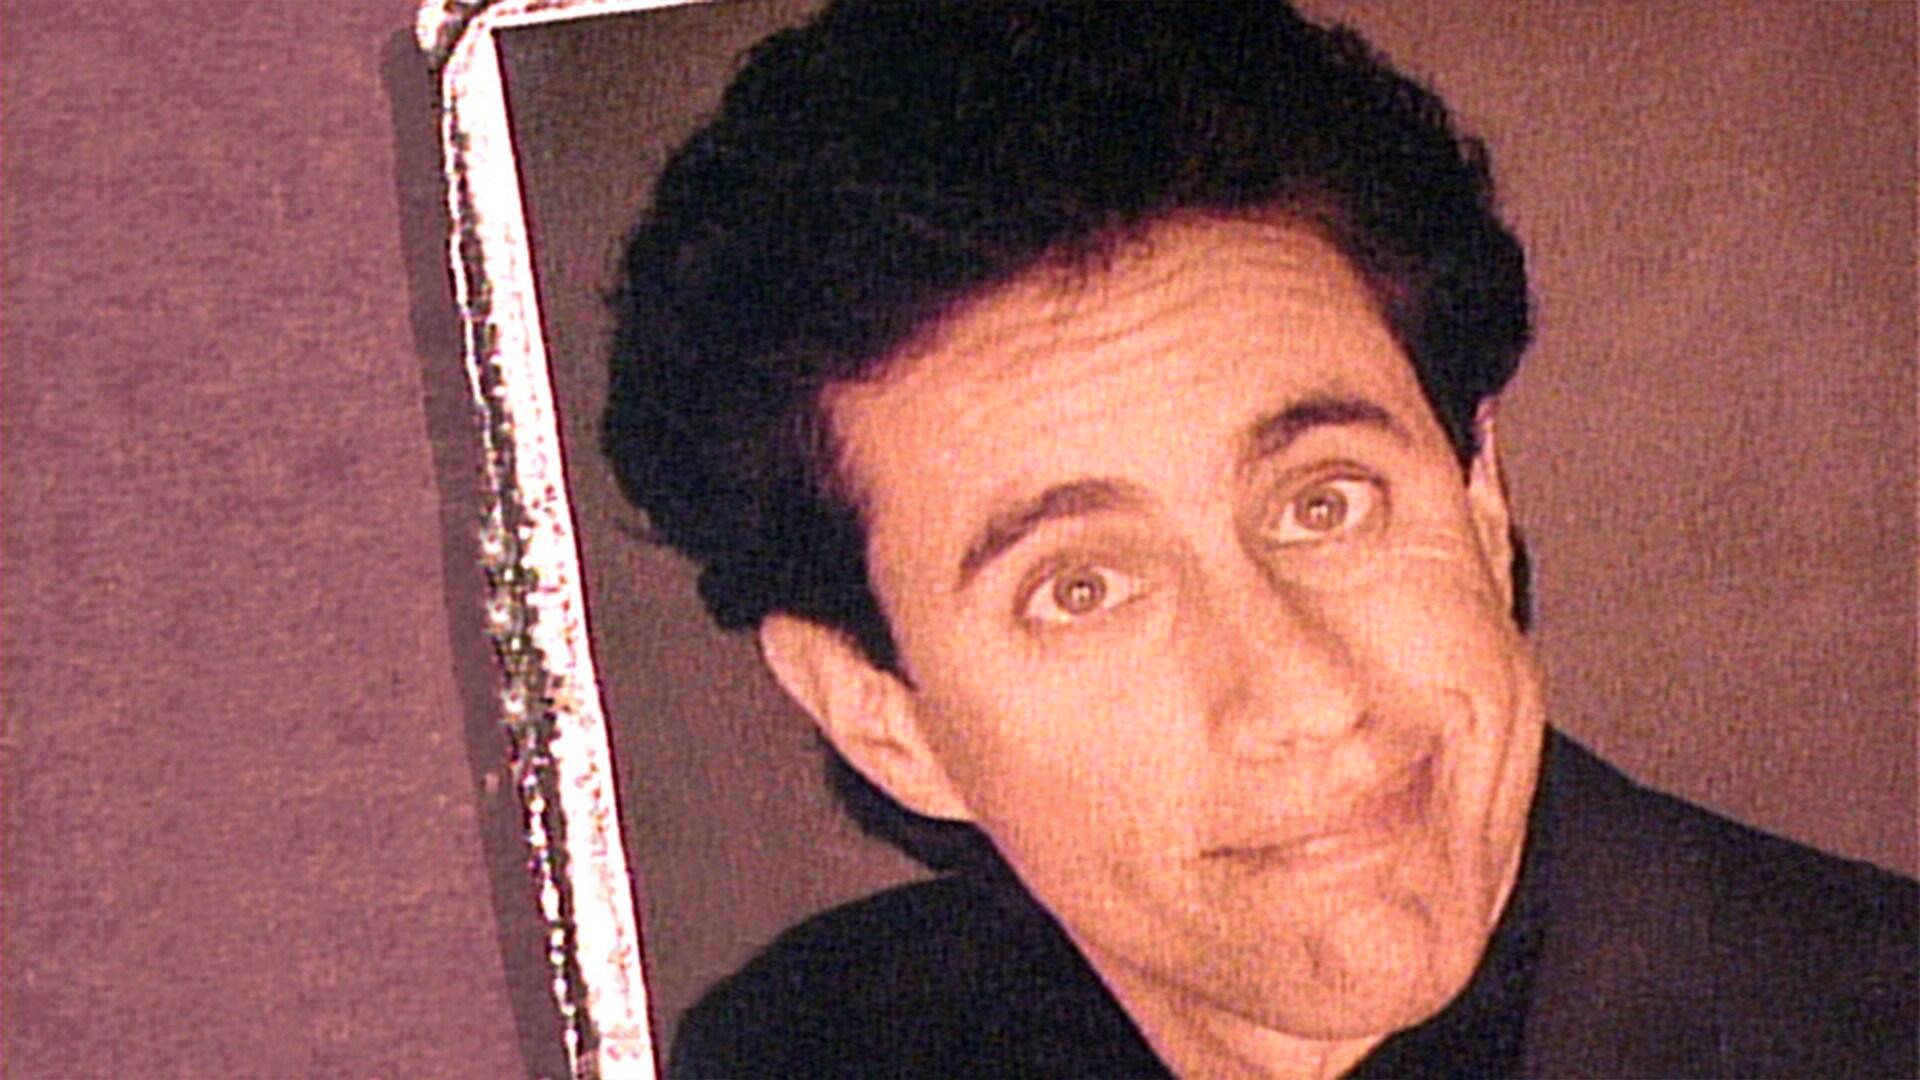 Jerry Seinfeld: April 18, 1992